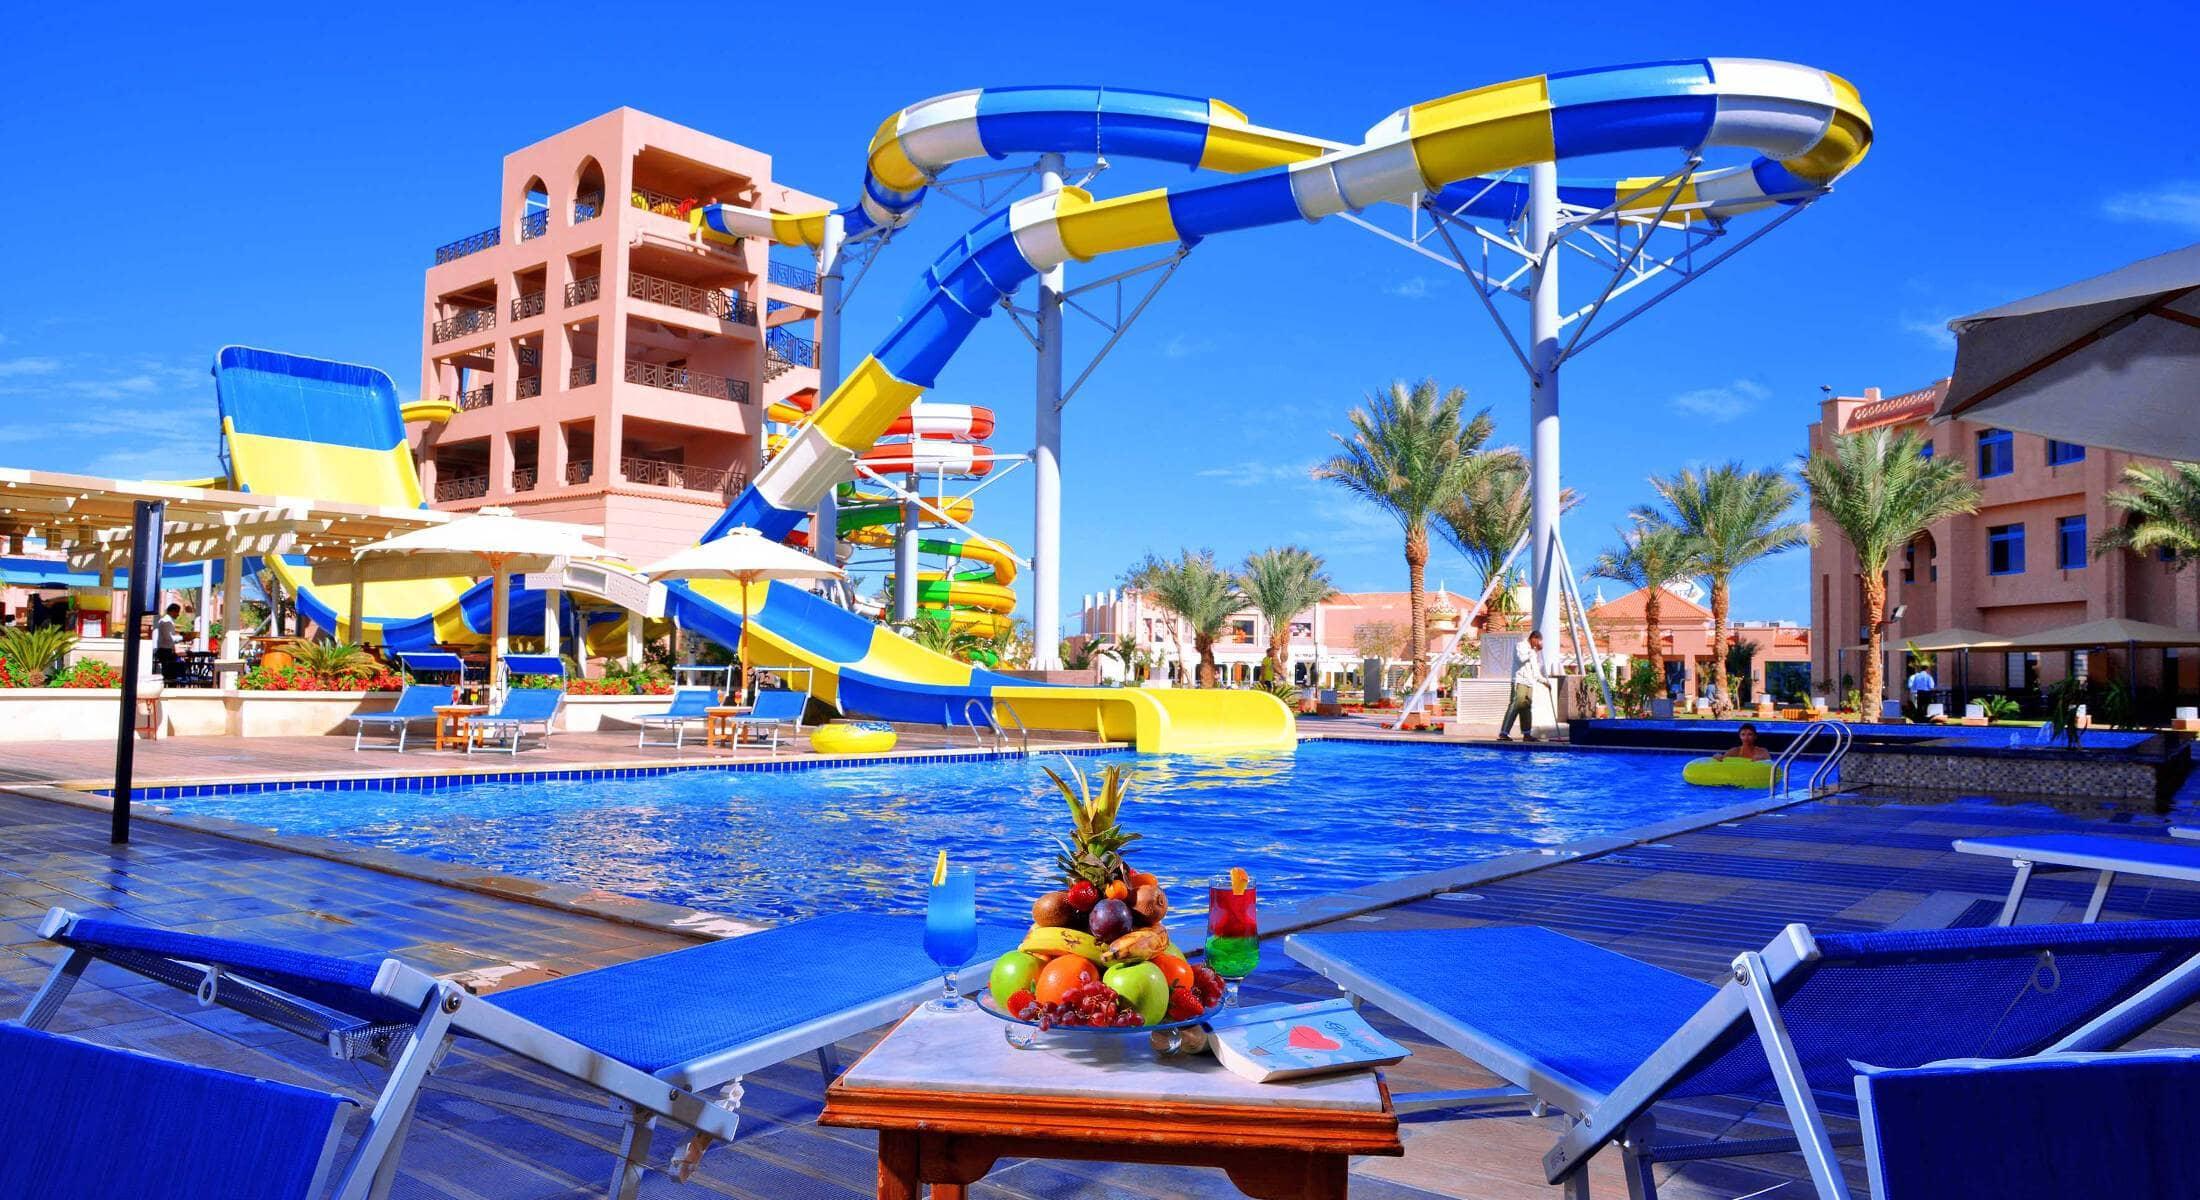 dovolenka Egypt, Hurghada - Albatros Aqua Parkdovolenka Egypt, Hurghada - Albatros Aqua Park